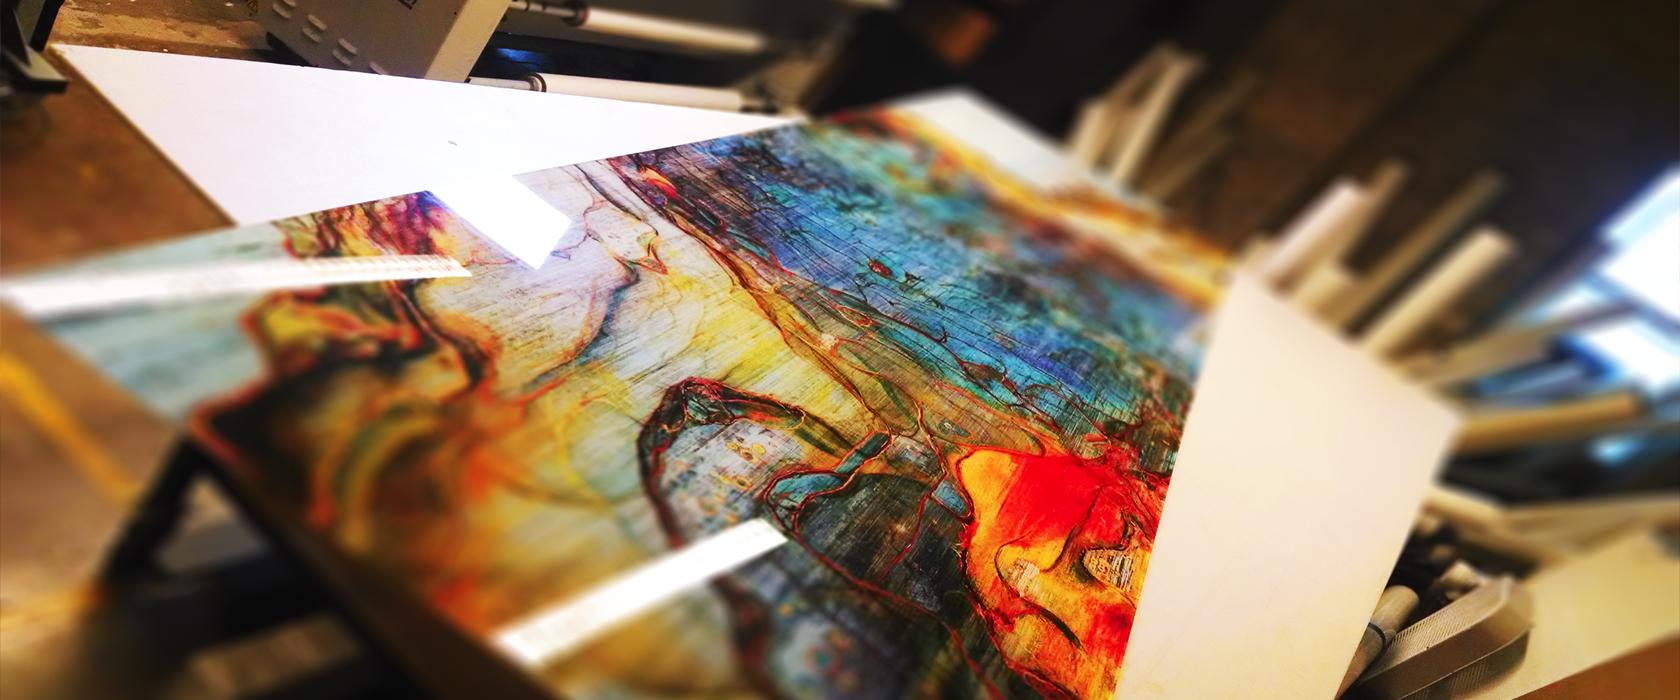 Chris_crane_gallery_abstract_glacial_woodbolt_art_corporate_art_abstract_artist_texas